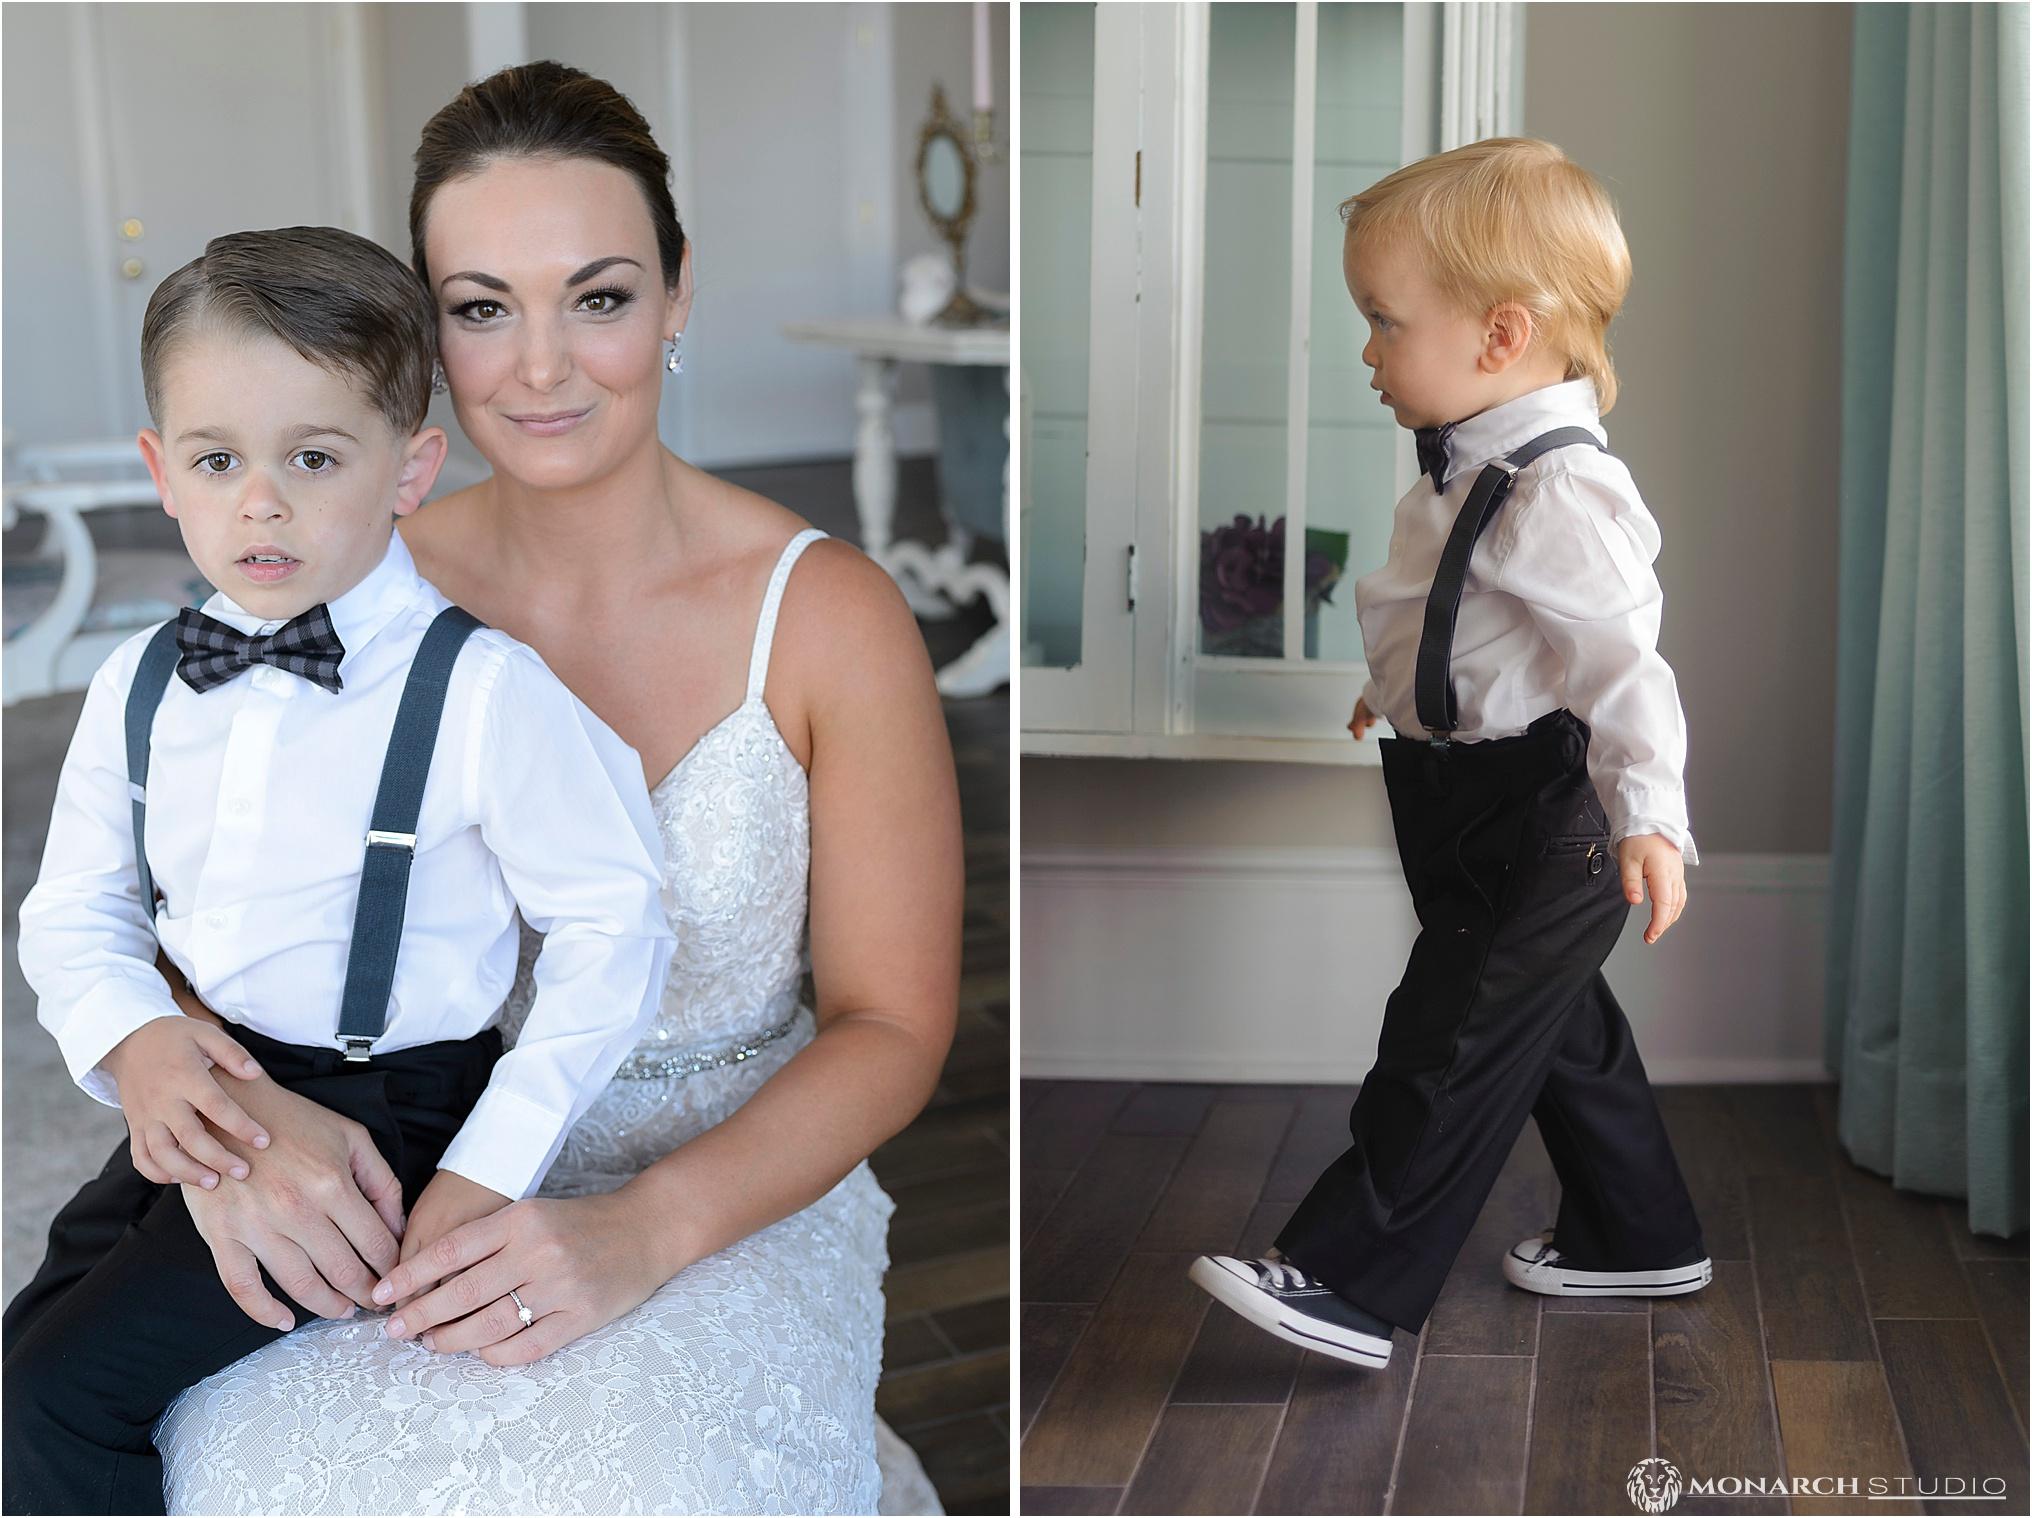 034-whiteroom-wedding-photographer-2019-05-22_0016.jpg